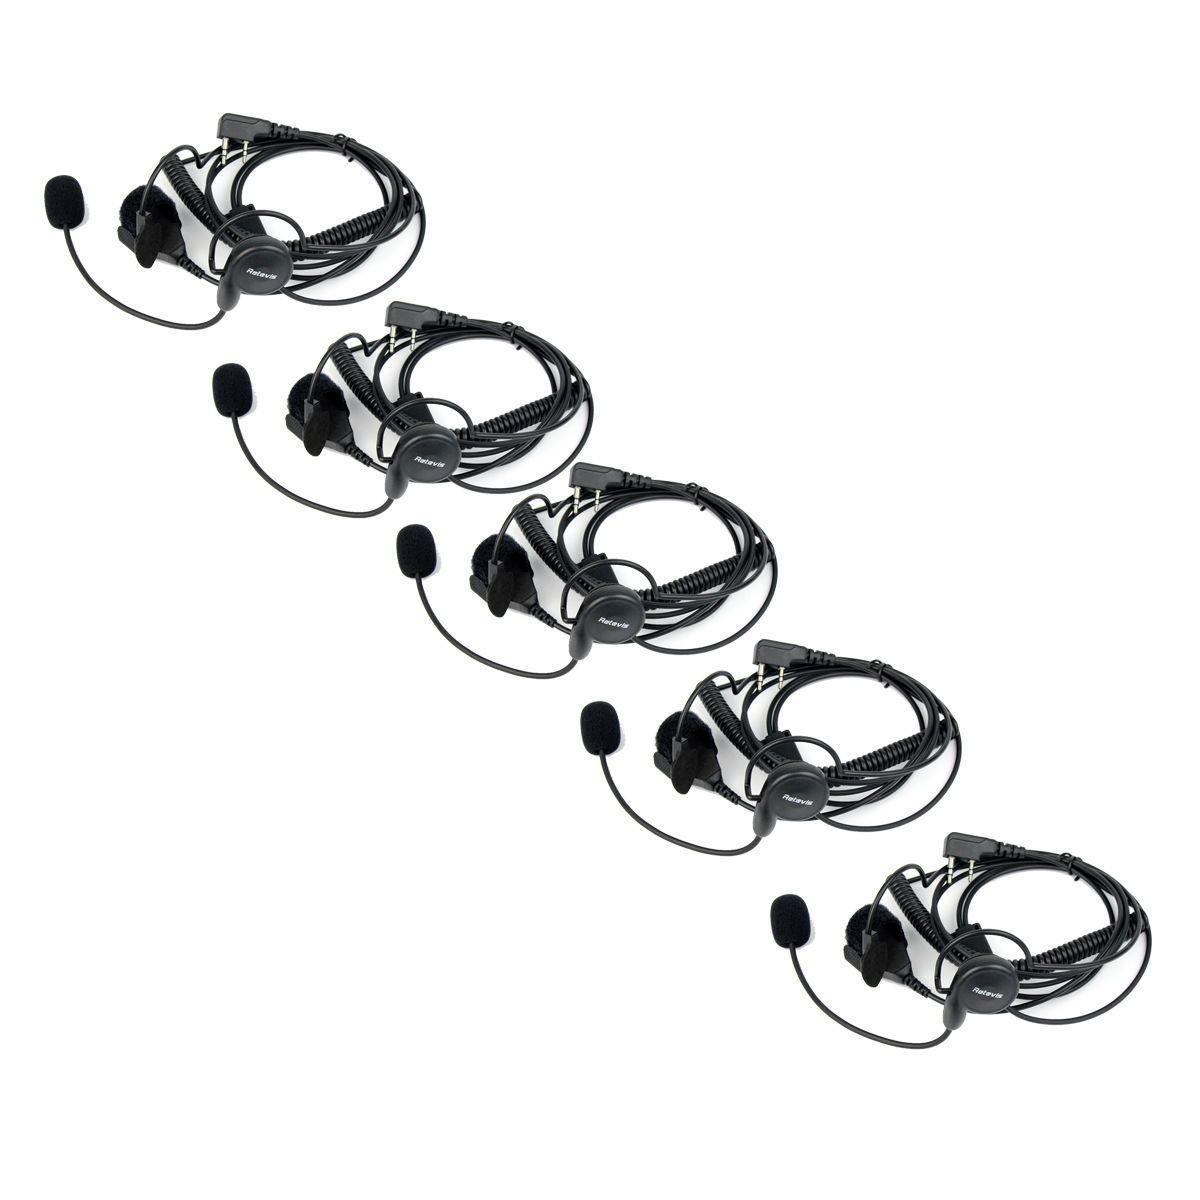 hight resolution of 5x 2 pin earpiece mic finger ptt headset for kenwood baofeng uv 5r 777 888s top kids walkie talkie long range walkie talkie from zyggood 52 31 dhgate com